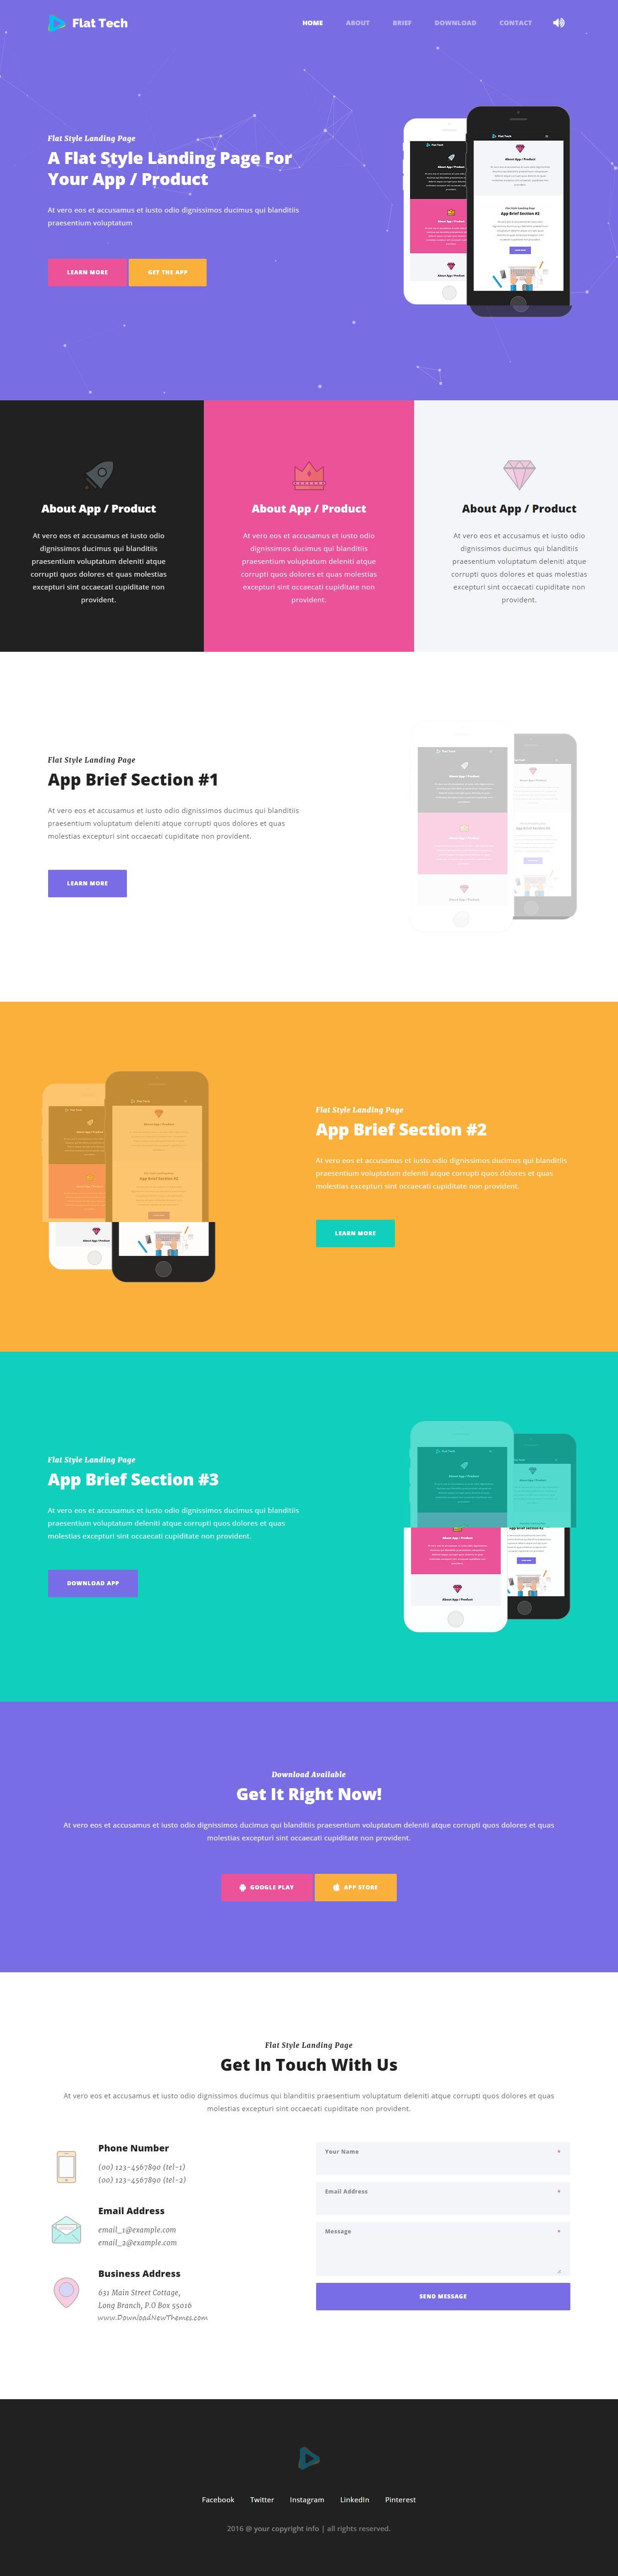 Flat Tech Flat Landing Page Template Web Design By Natsuki - Simple landing page template